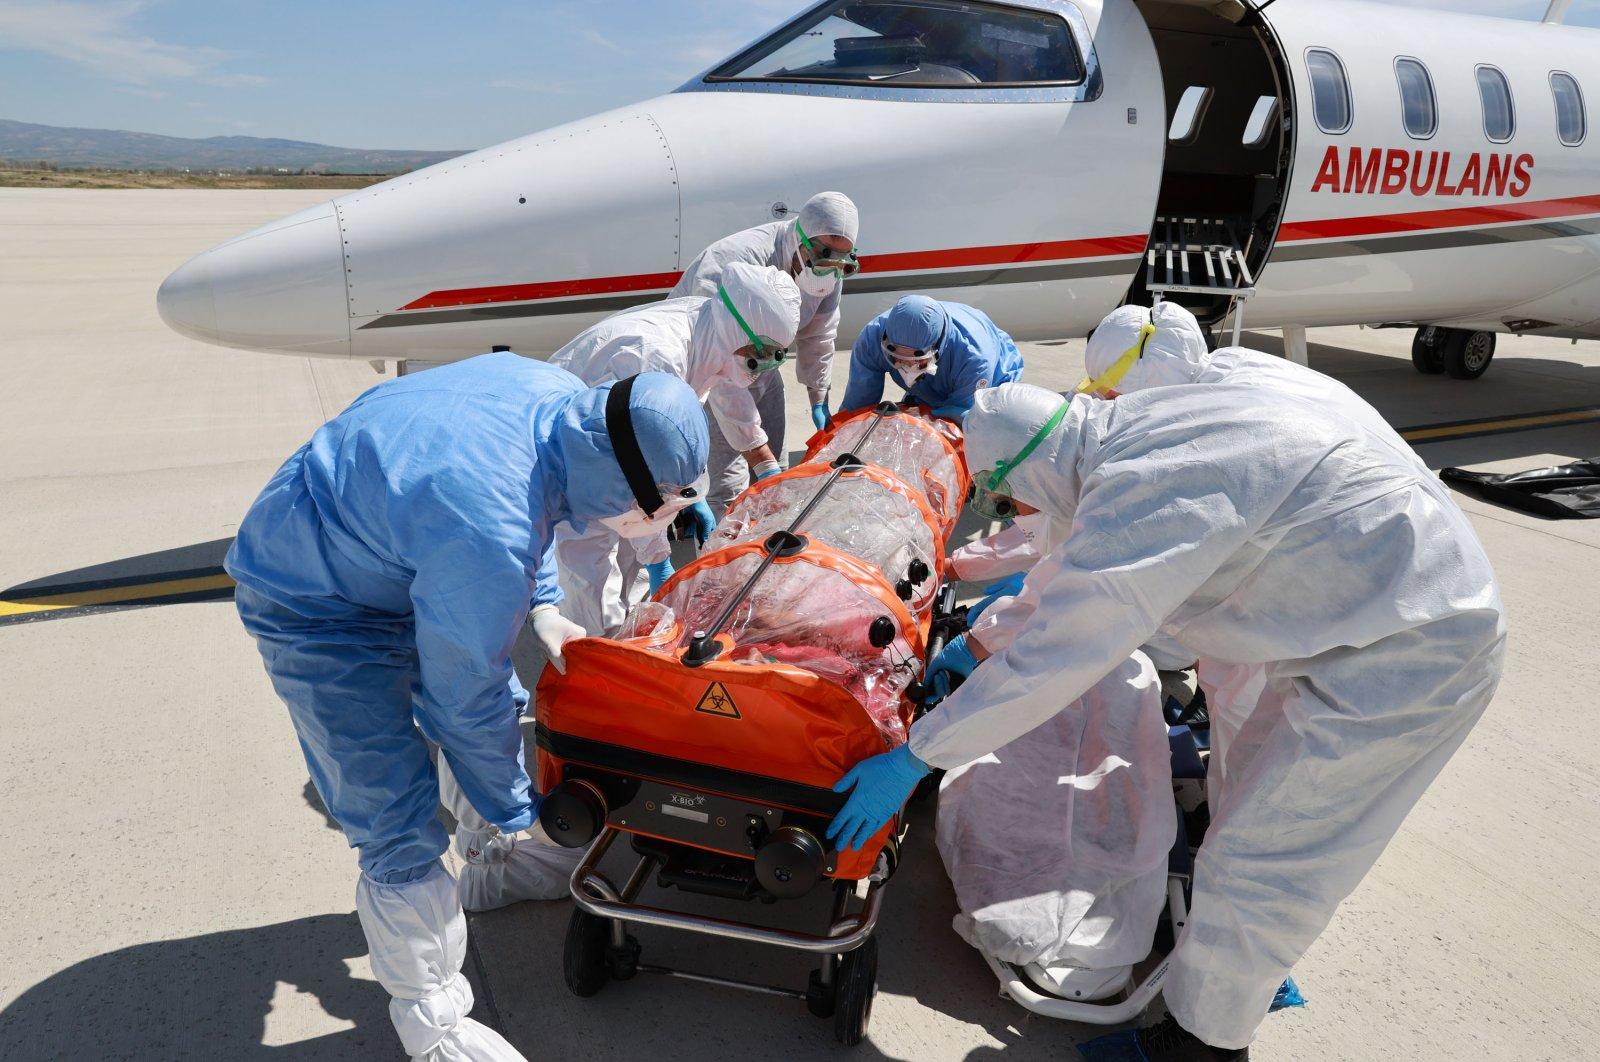 Medics take Emrullah Gülüşken off an air ambulance from Sweden at Ankara Esenboğa Airport, Ankara, Turkey, April 26, 2020. (DHA Photo)